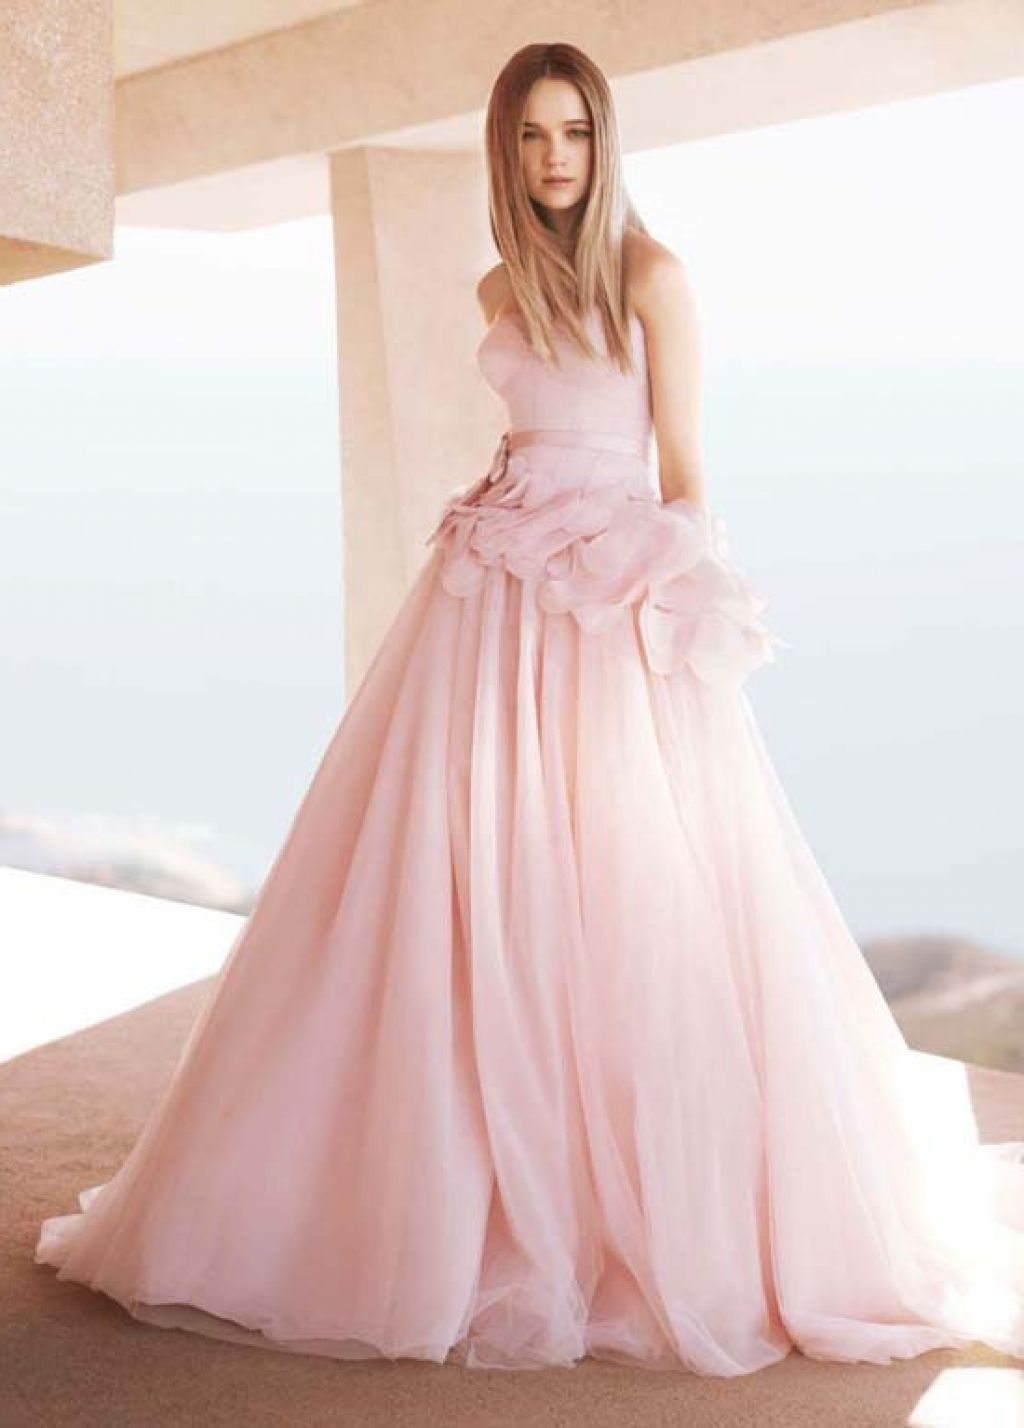 Pale pink wedding dresses pink weddings pinterest pale pink